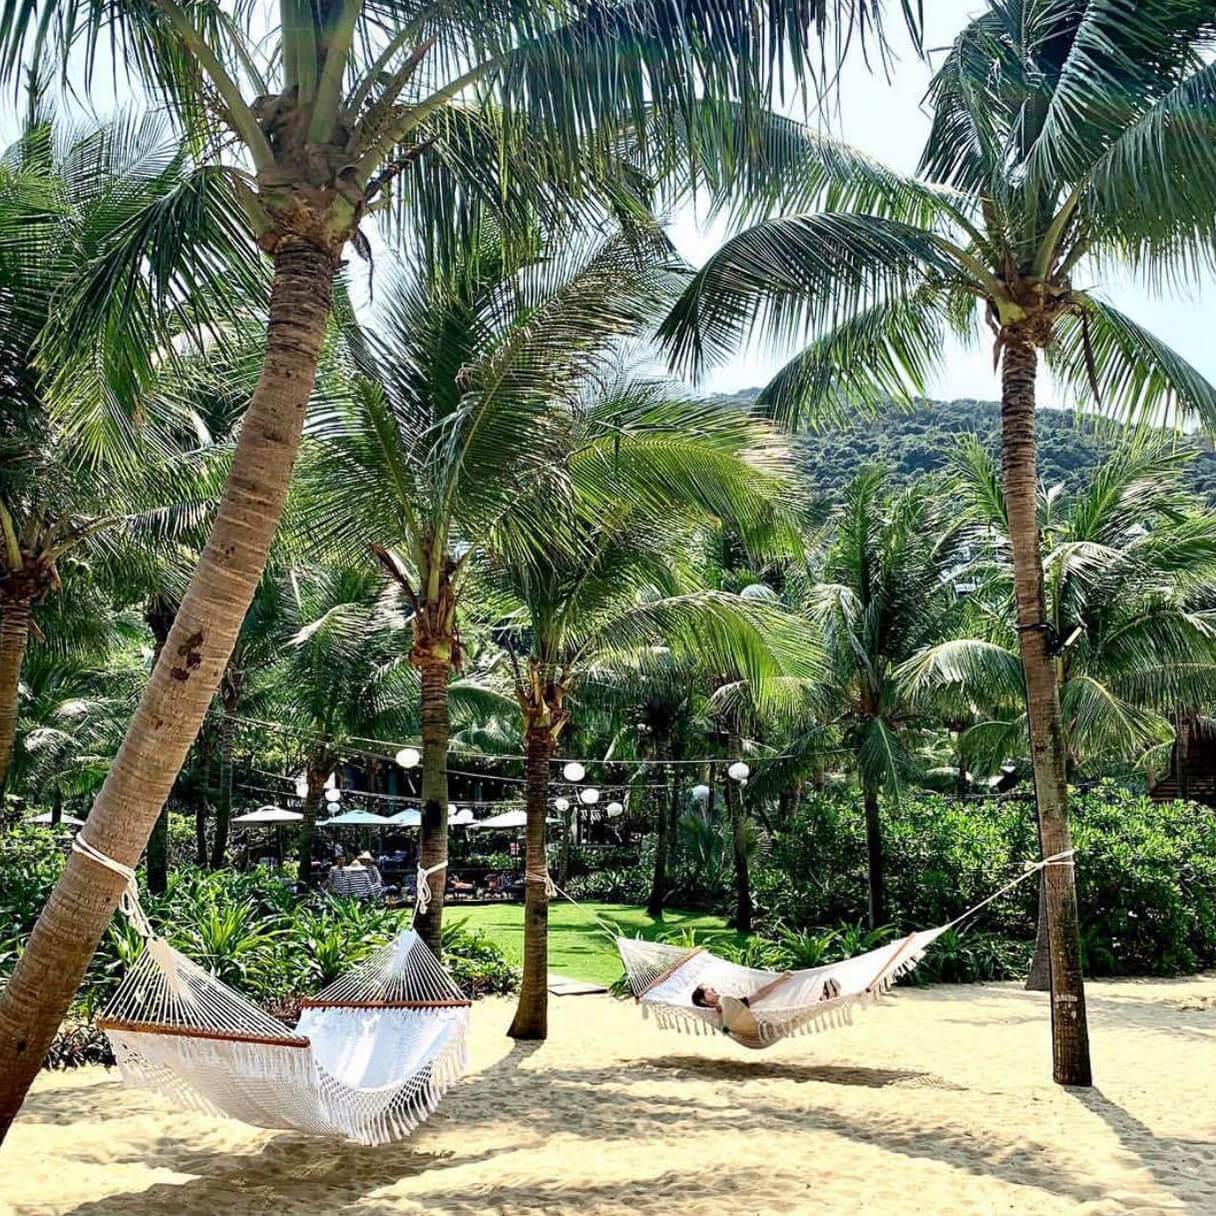 Ntercontinental Danang Sun Peninsula Resort Tiep Tuc Lot Top 100 Khach San Hang Dau The Gioi 2019 02